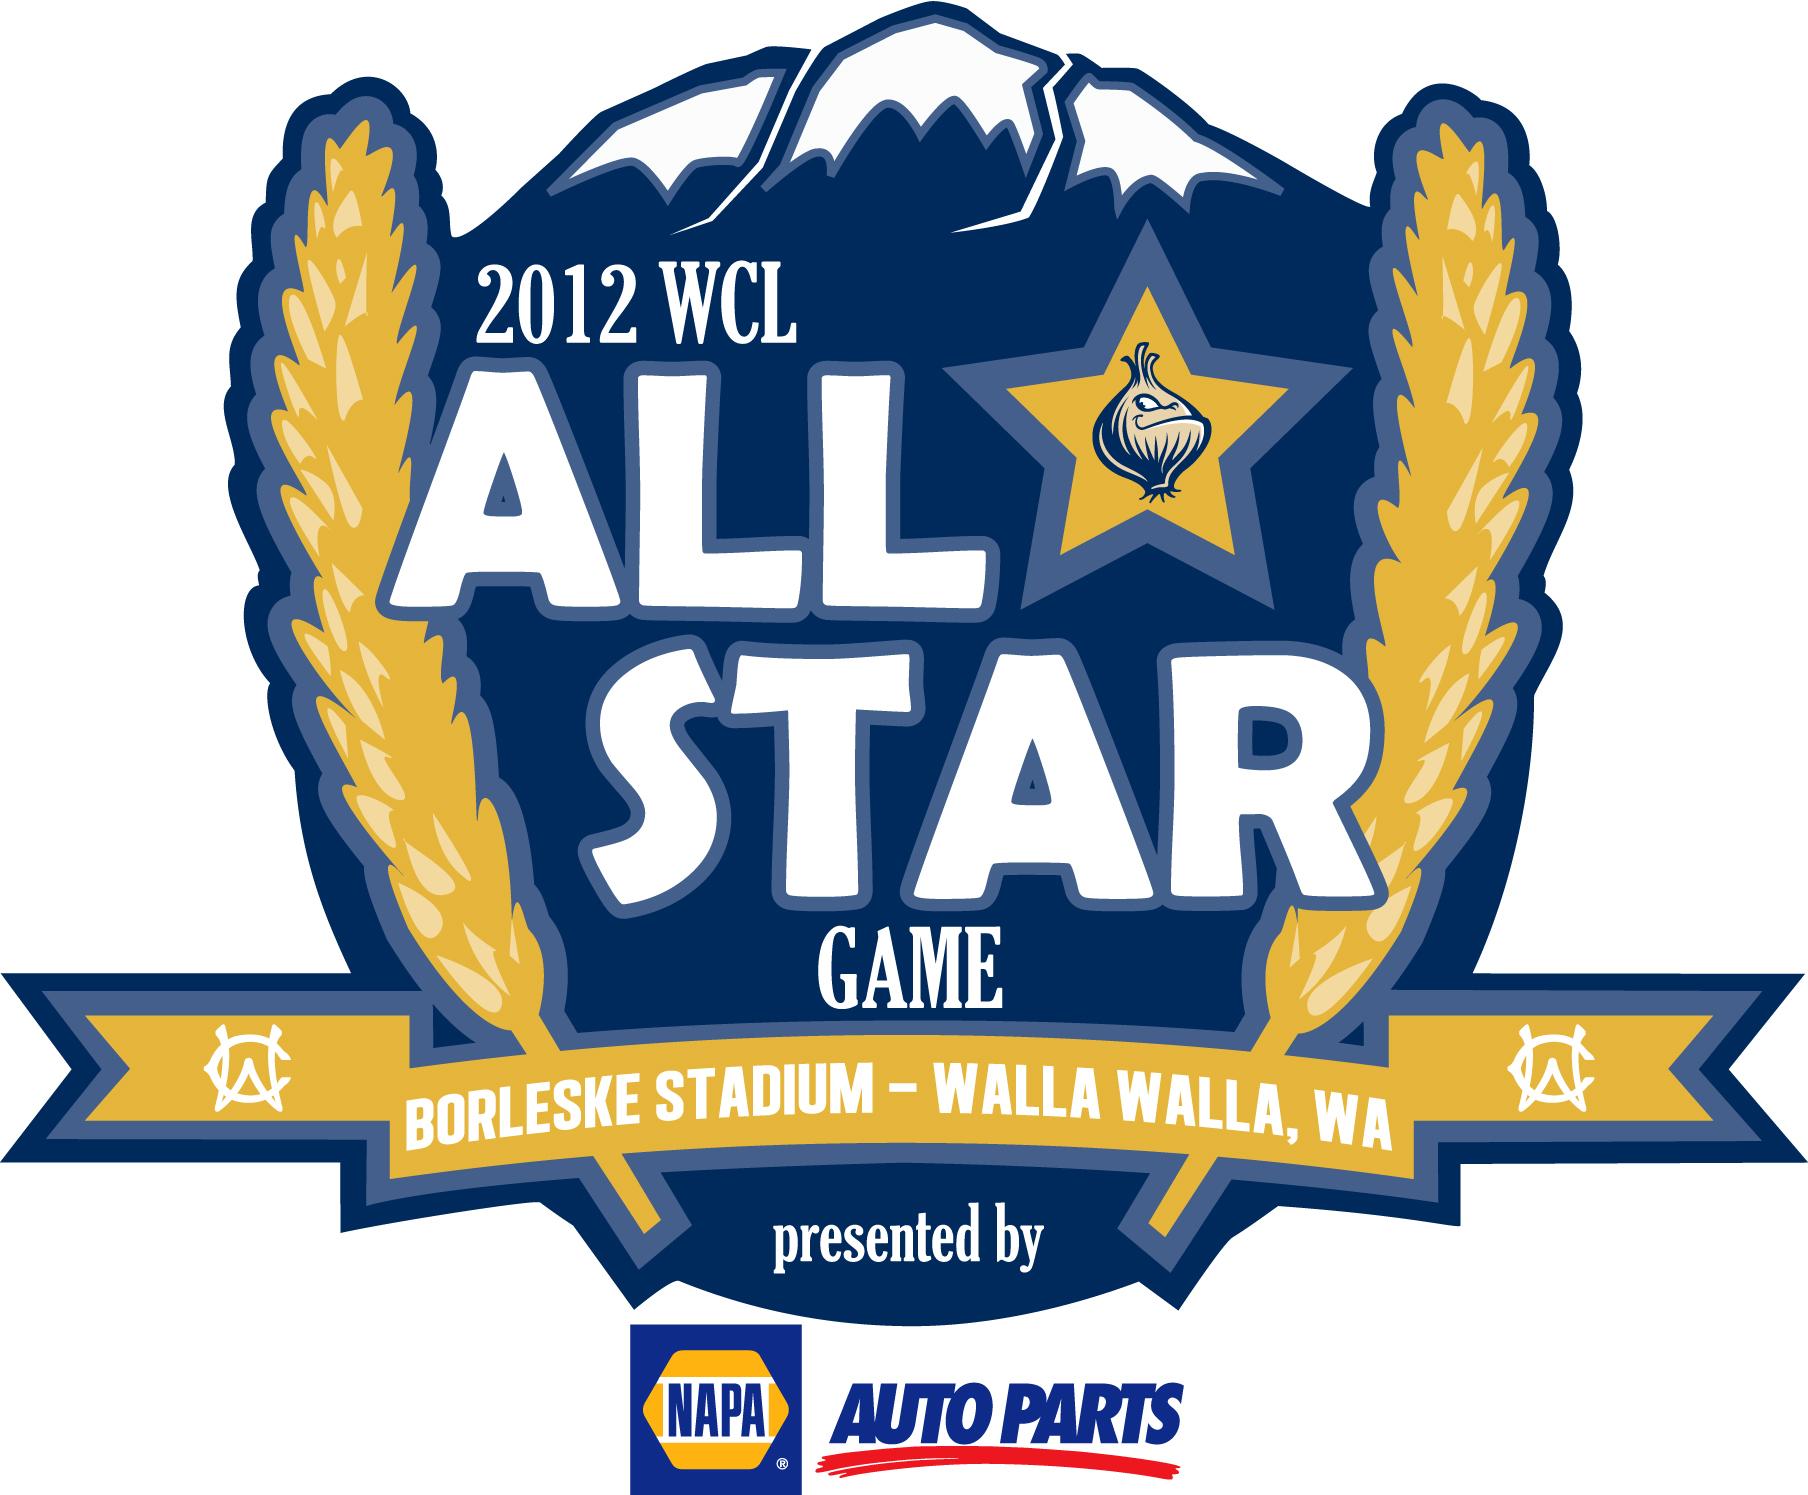 WCL All-Star Game Logo Primary Logo (2012) - 2012 WCL All-Star Game - Walla Walla, Washington  SportsLogos.Net